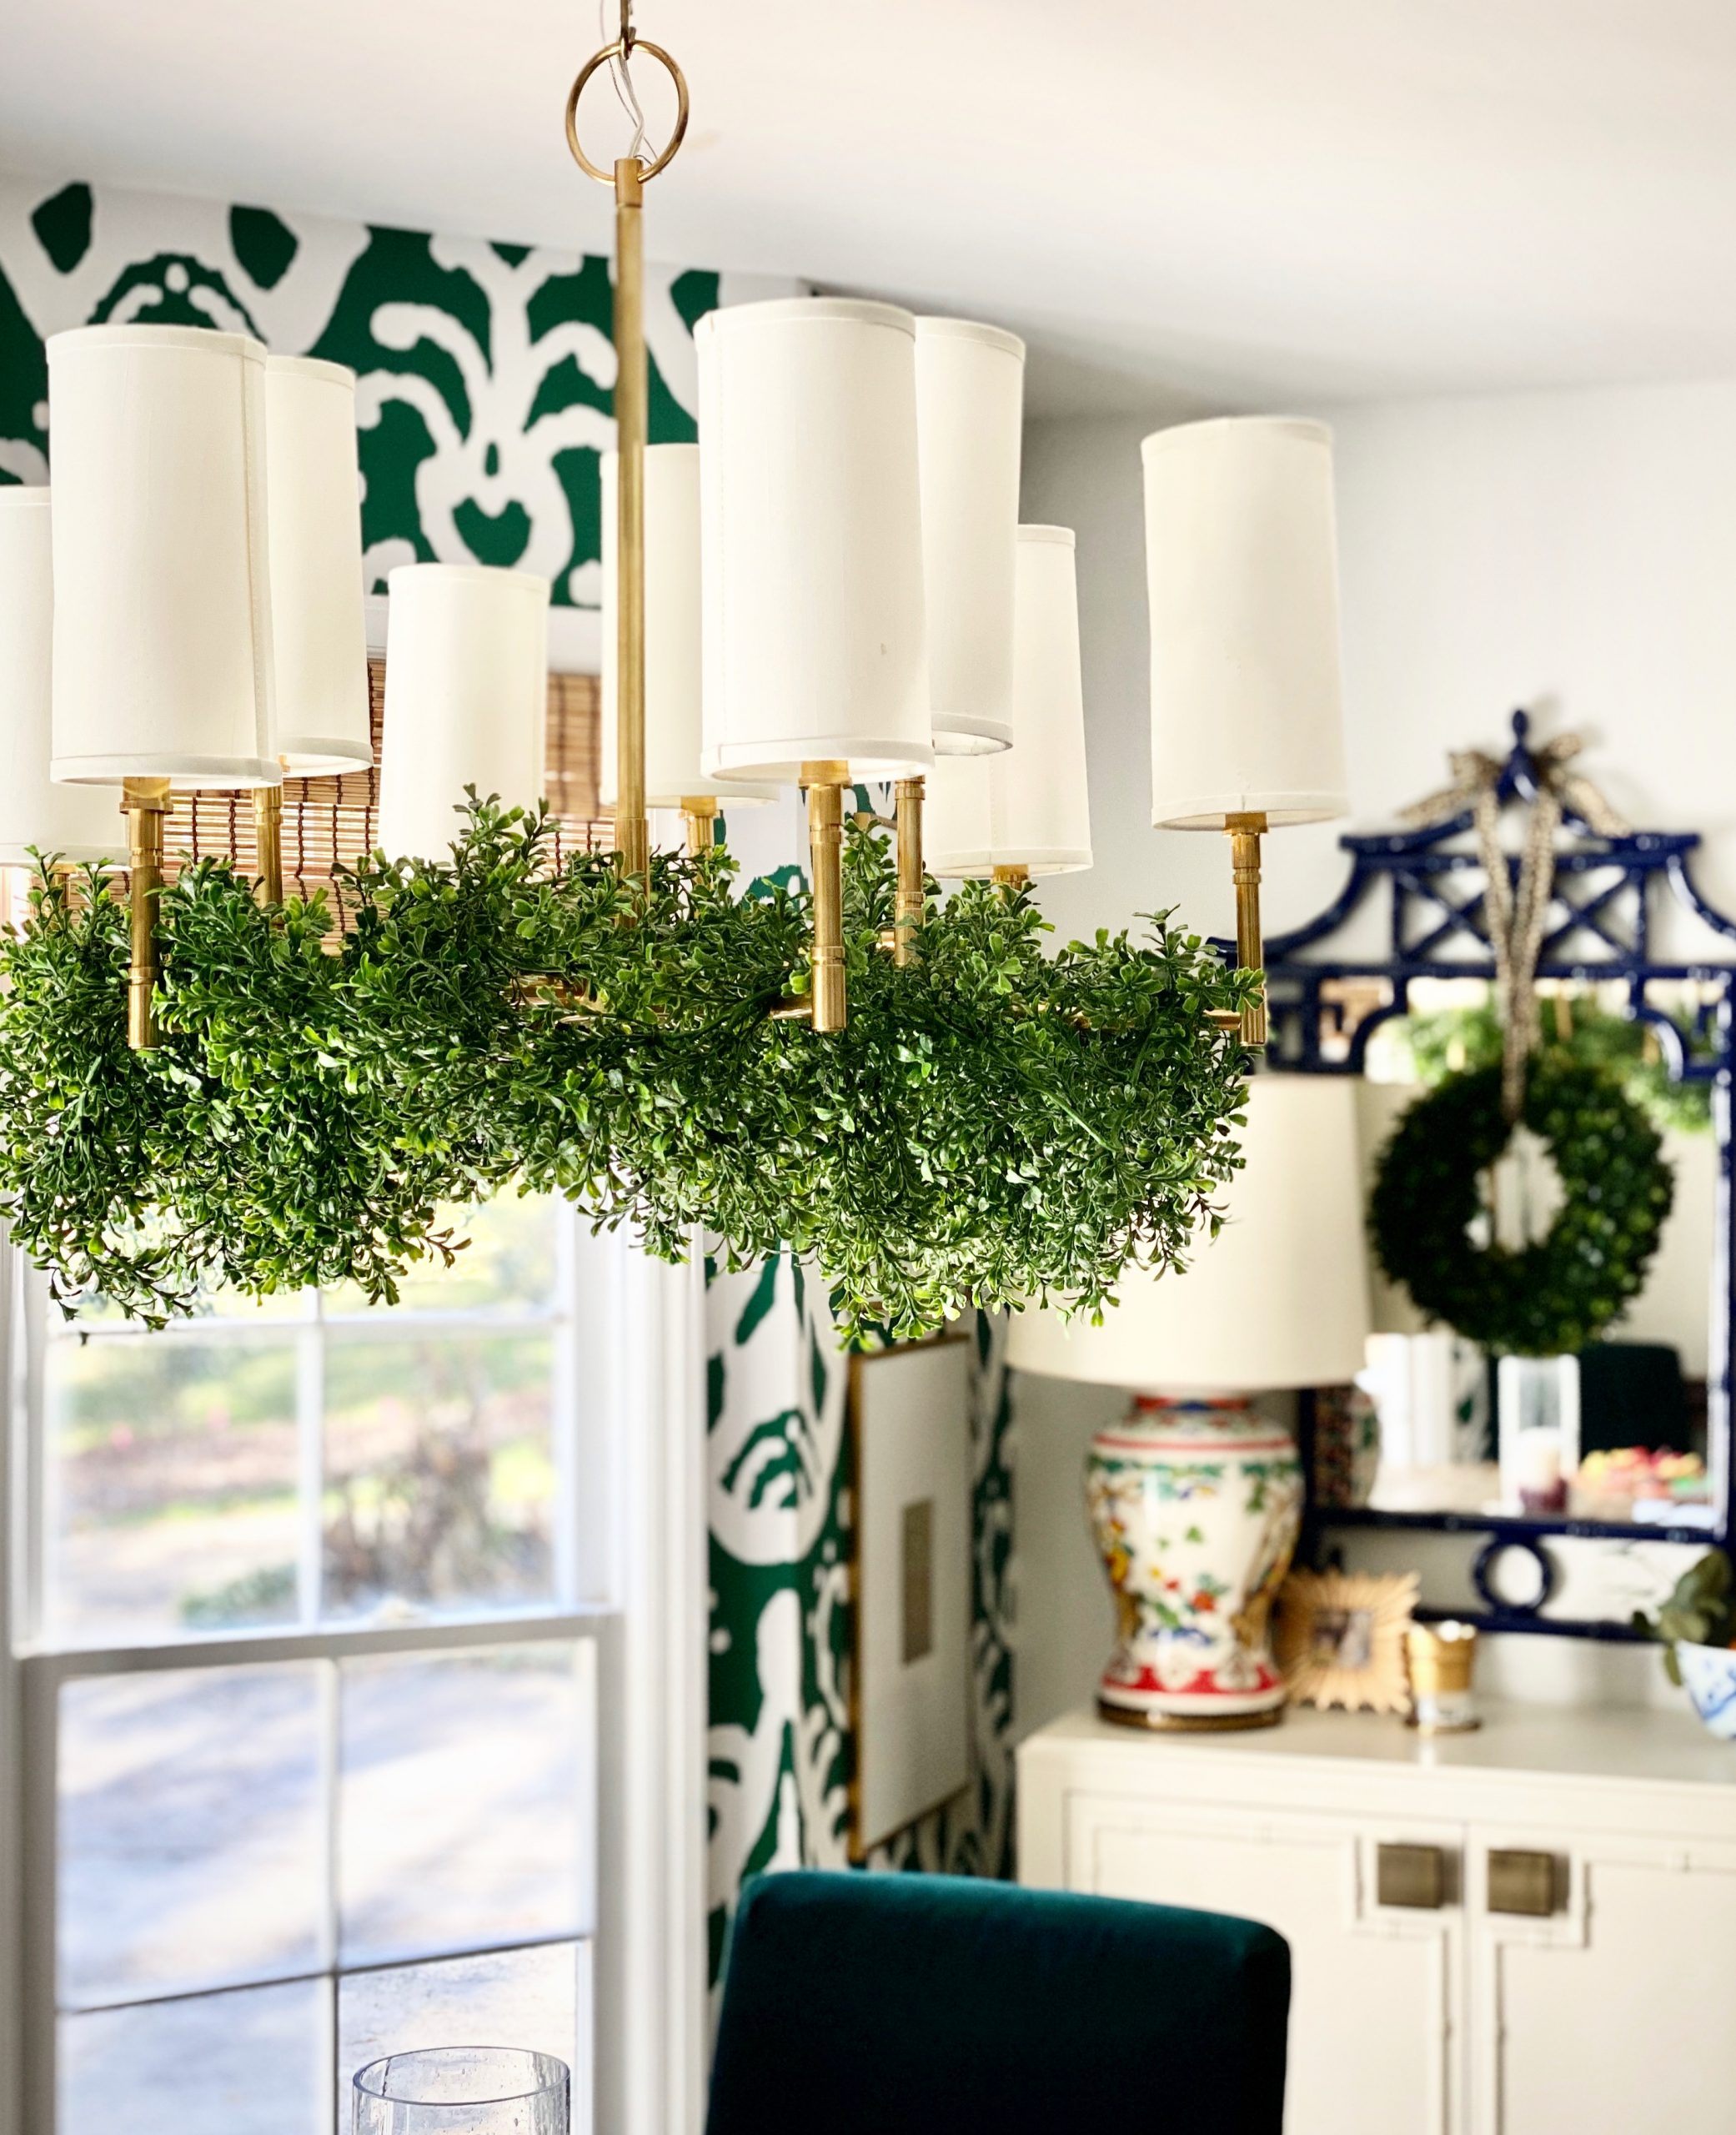 garland-from-chandelier